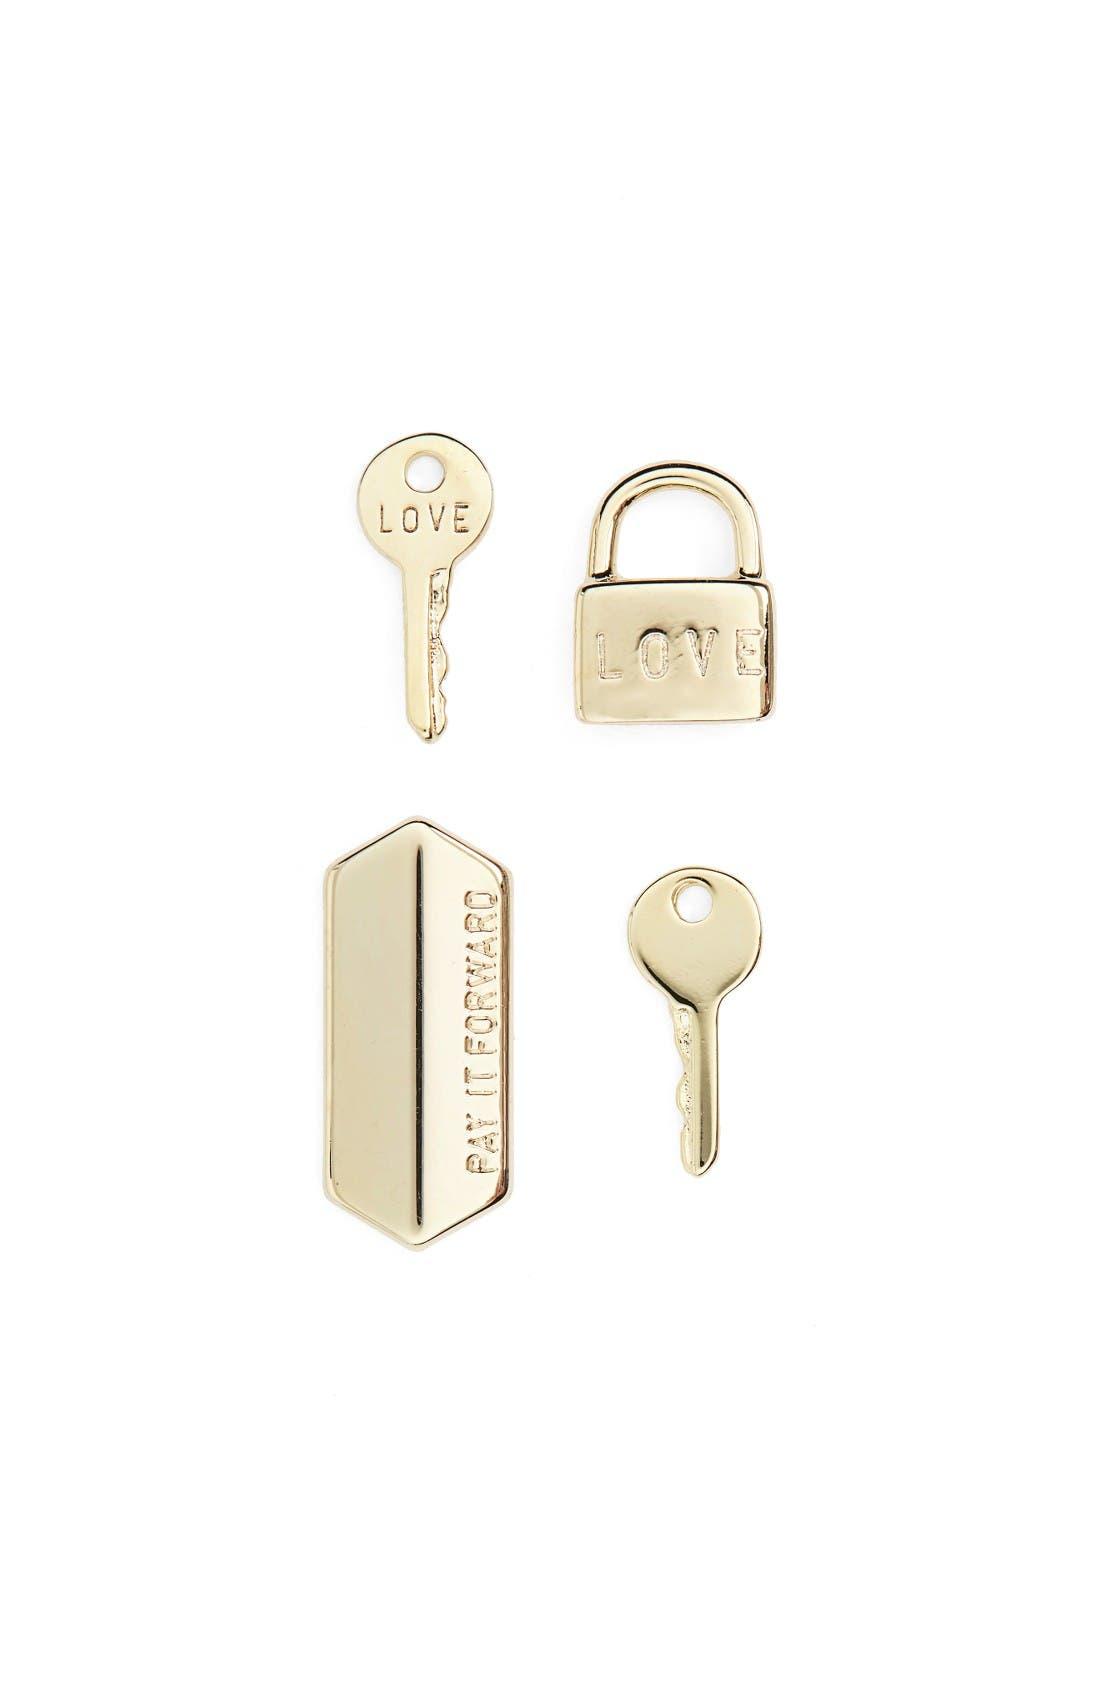 The Giving Keys Set of 4 Love Key Stud Earrings